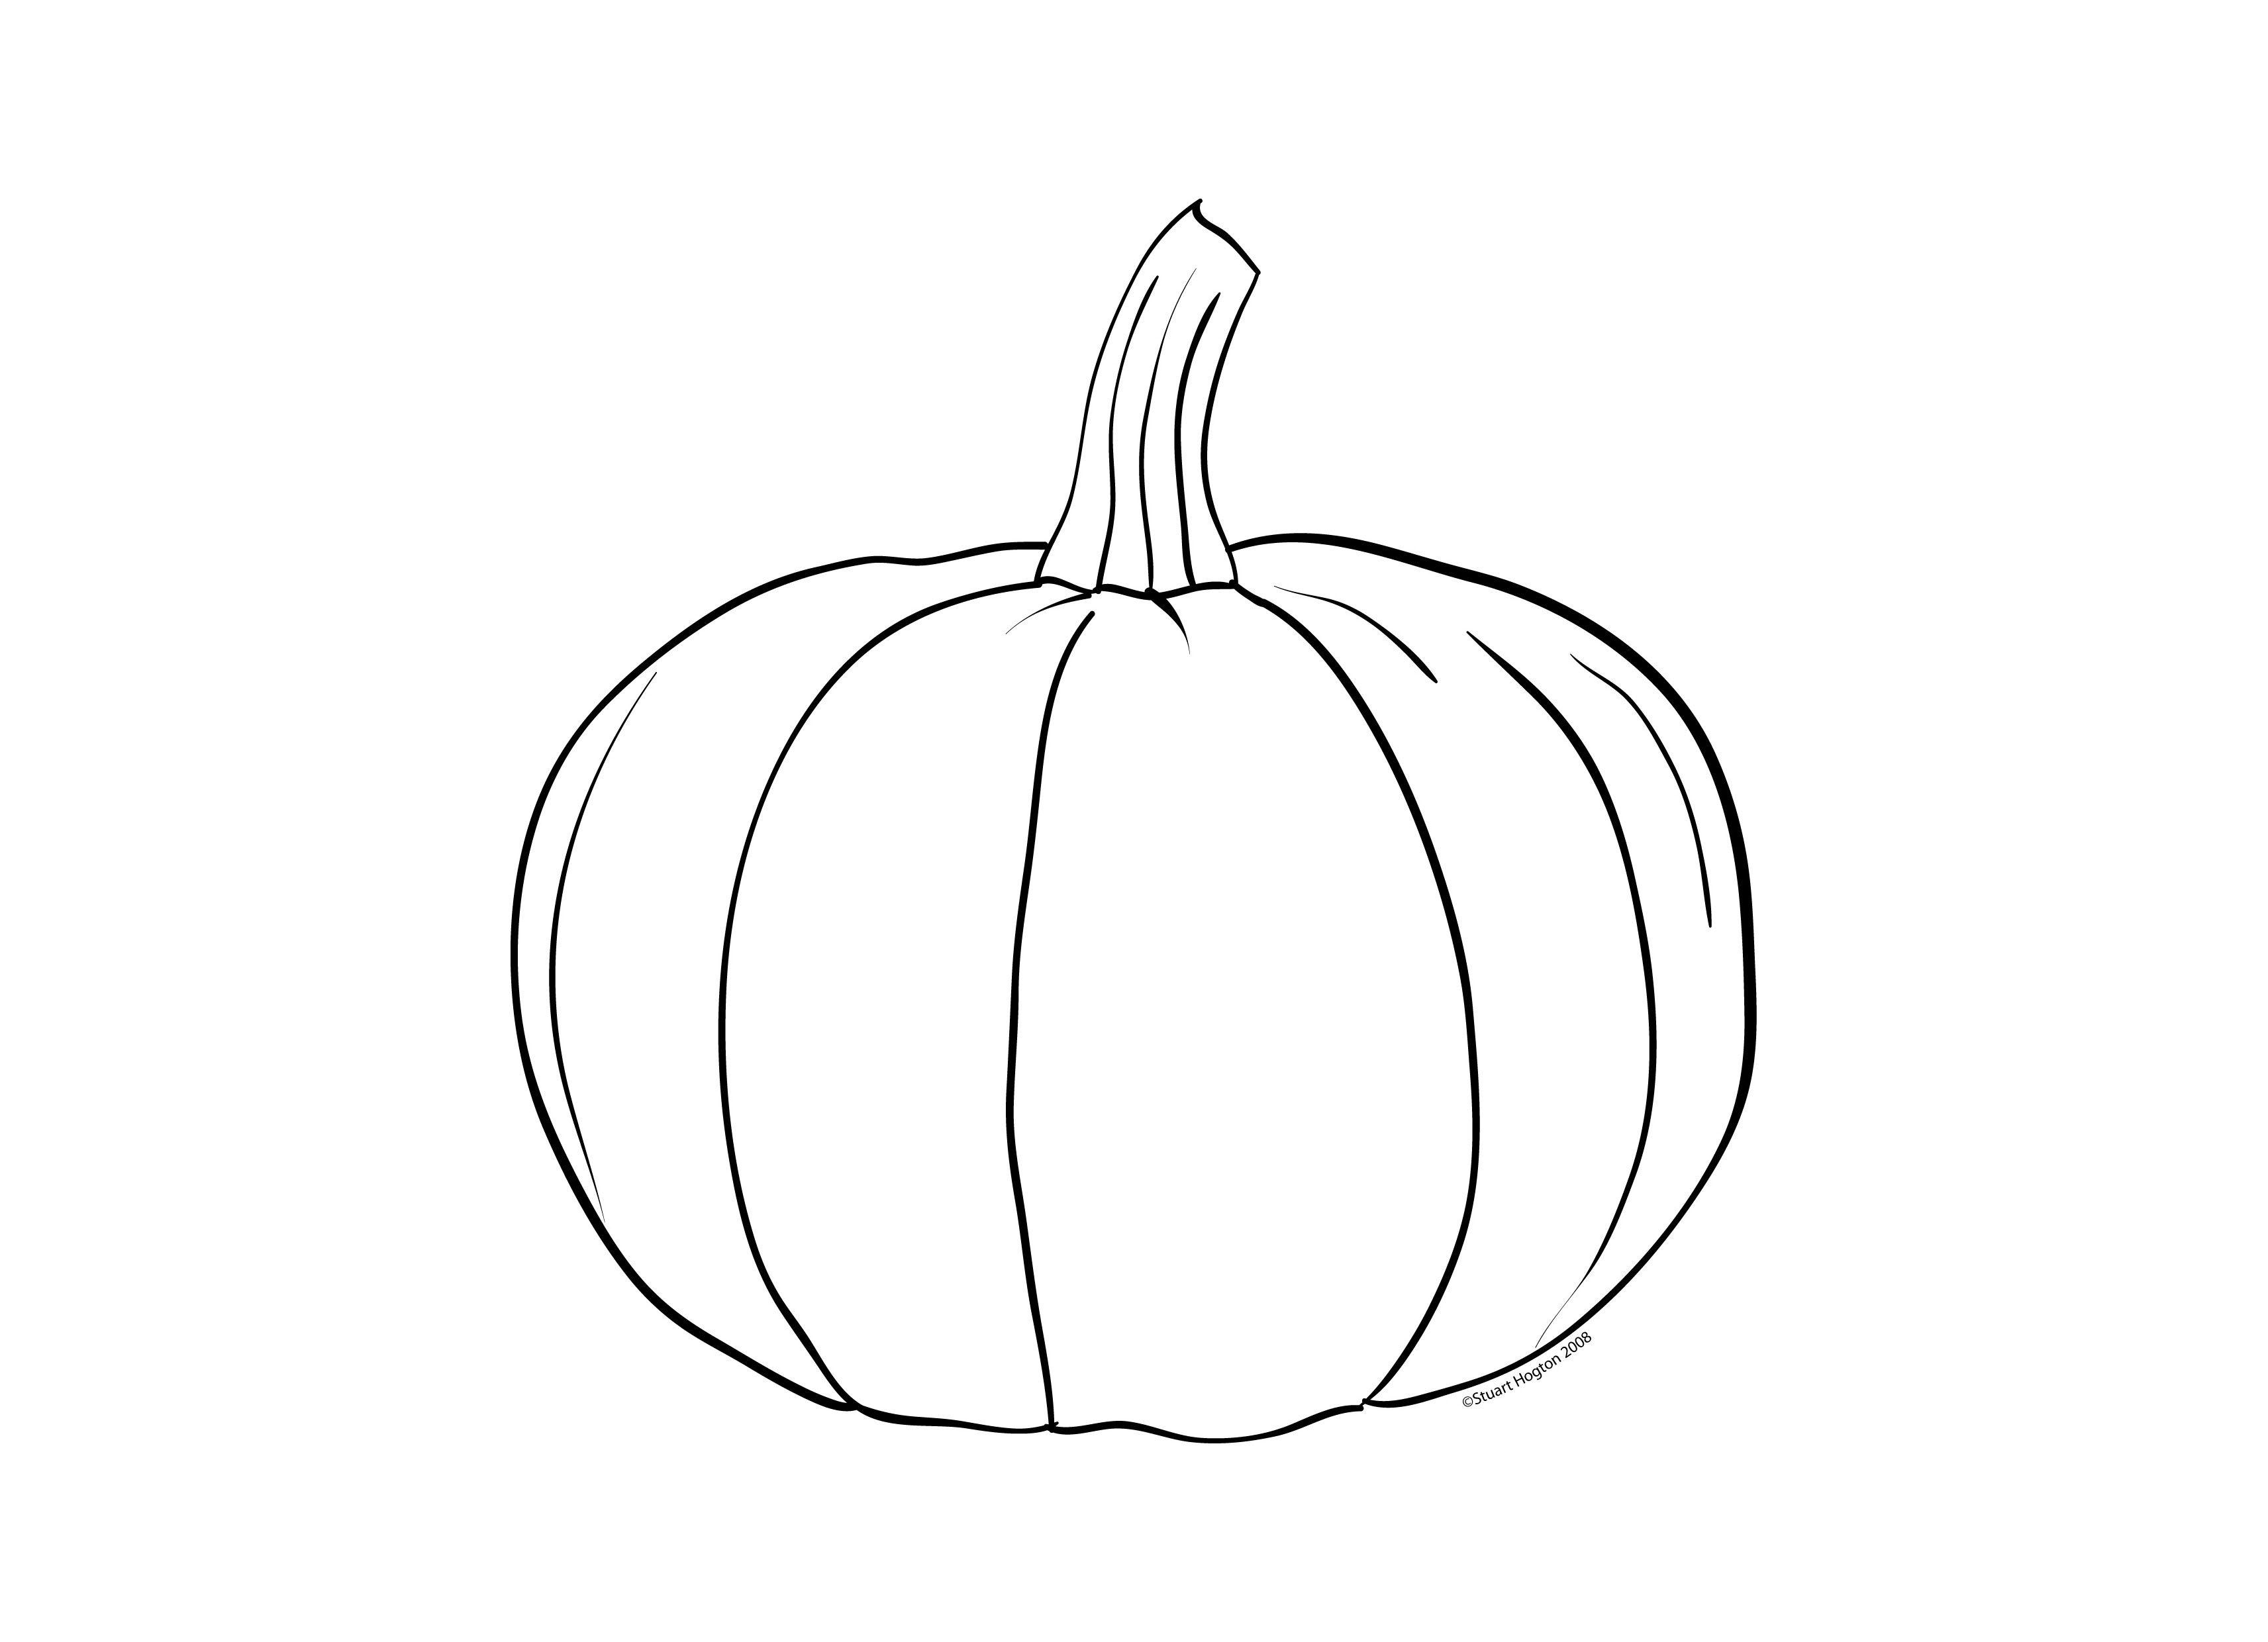 pumpkin pattern coloring page printable Free Large